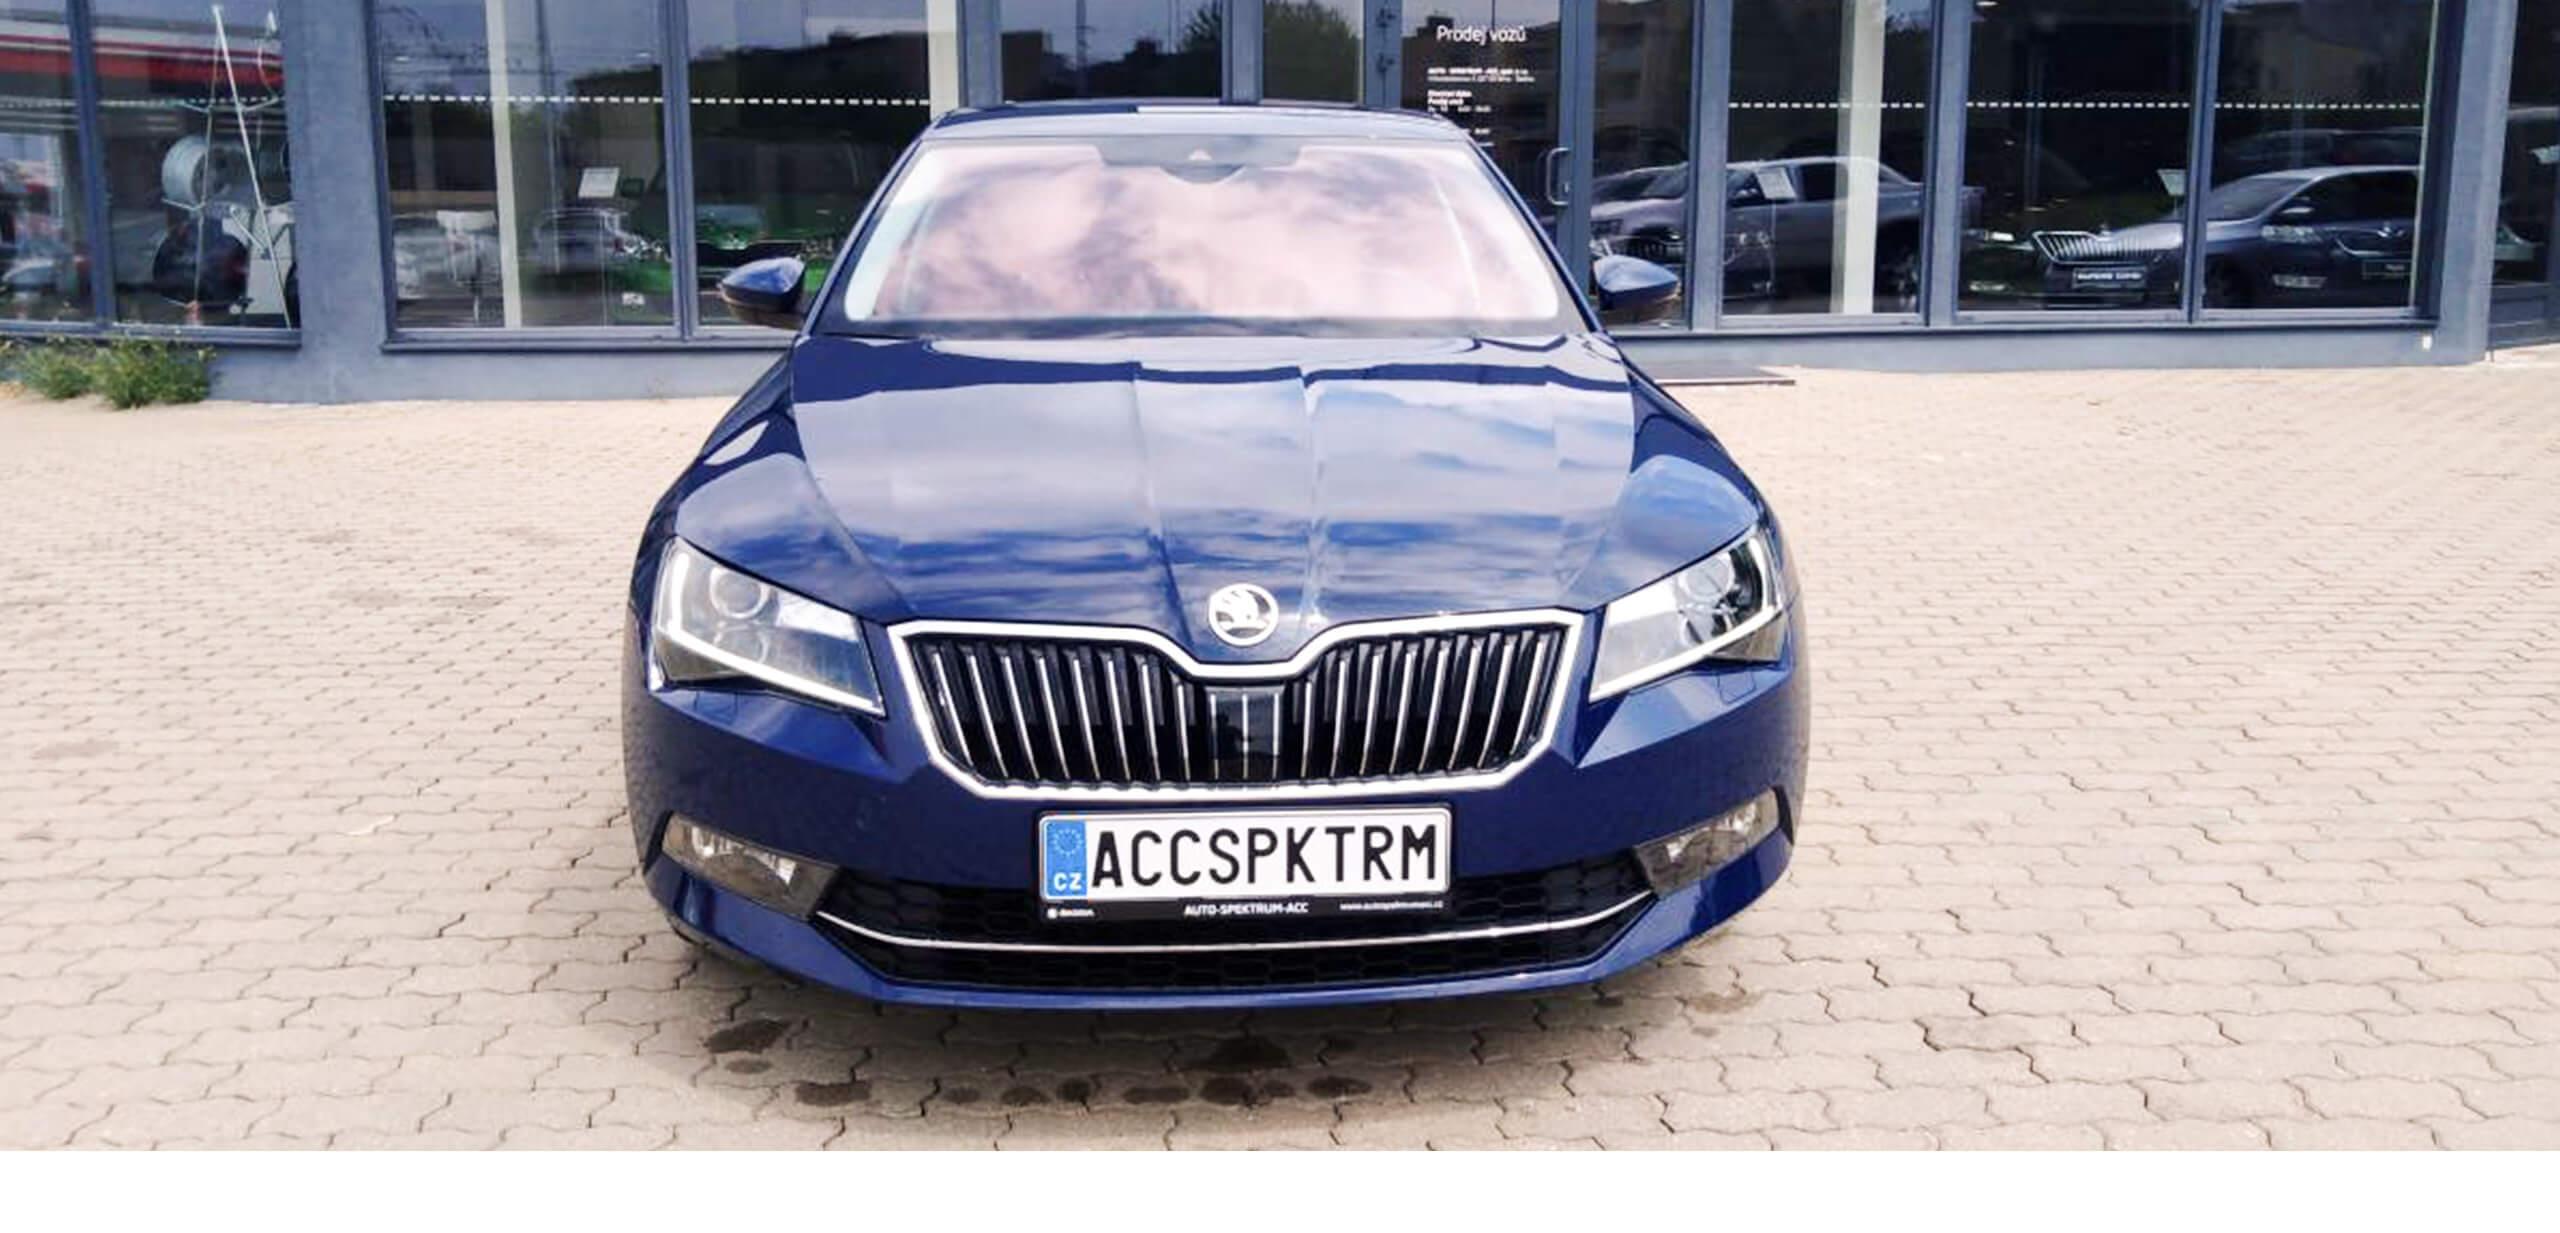 Autospektrum ACC brno slatina Škoda Superb STYLE 2,0 TDI/ 140kW 4X4 DSG